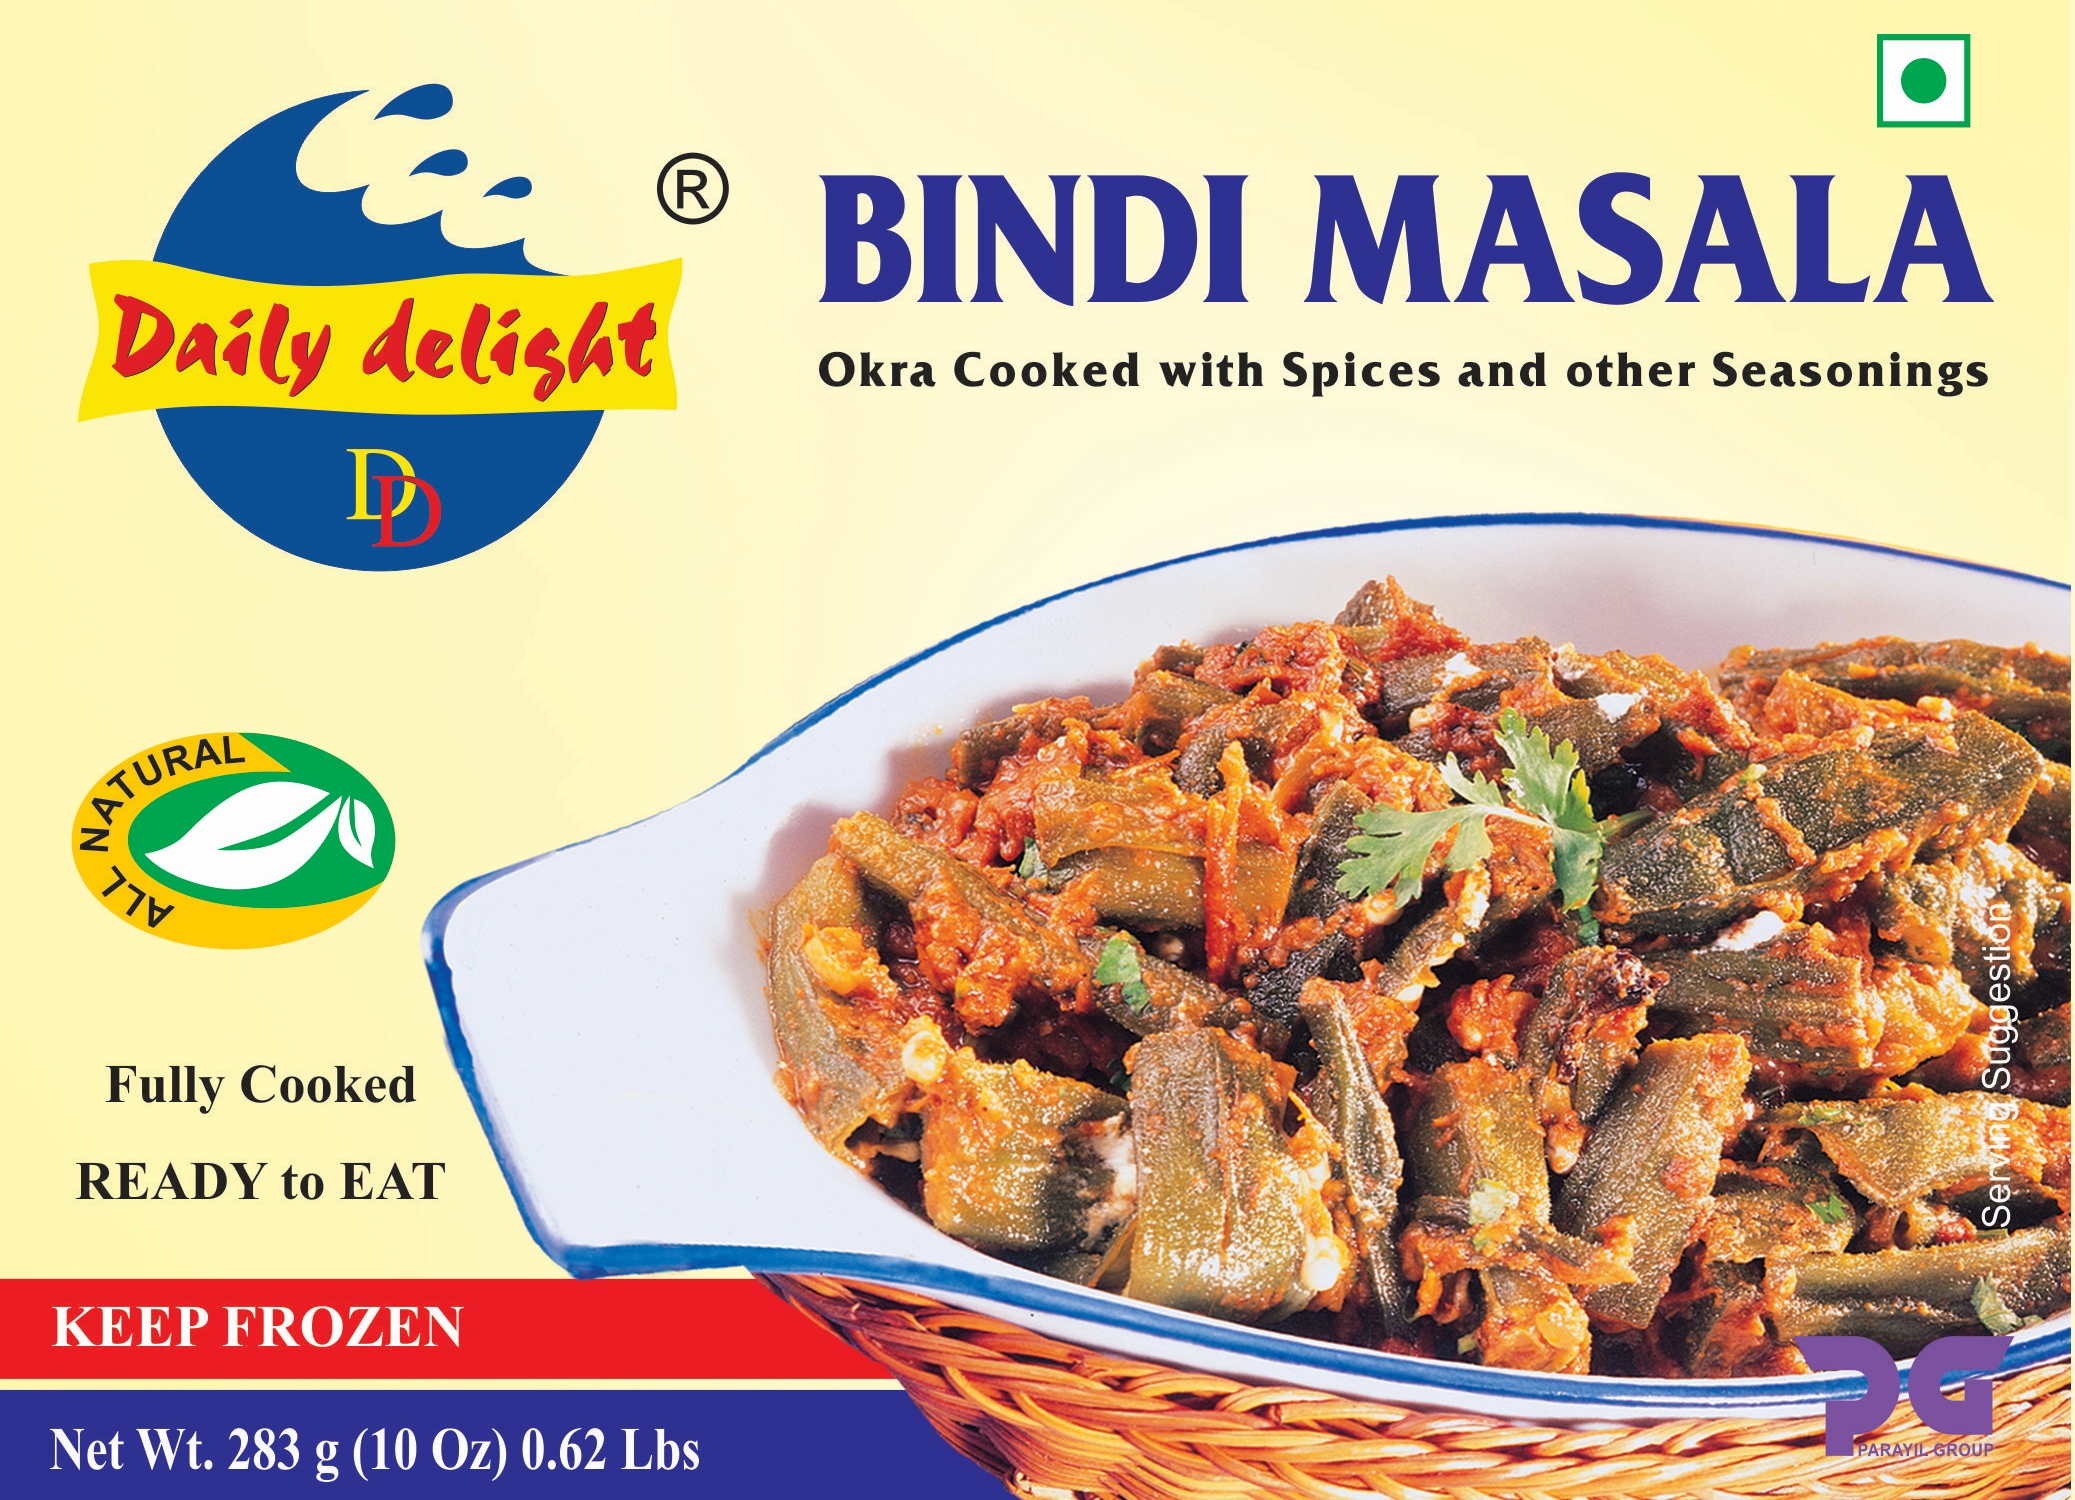 Daily Delight Bindi Masala